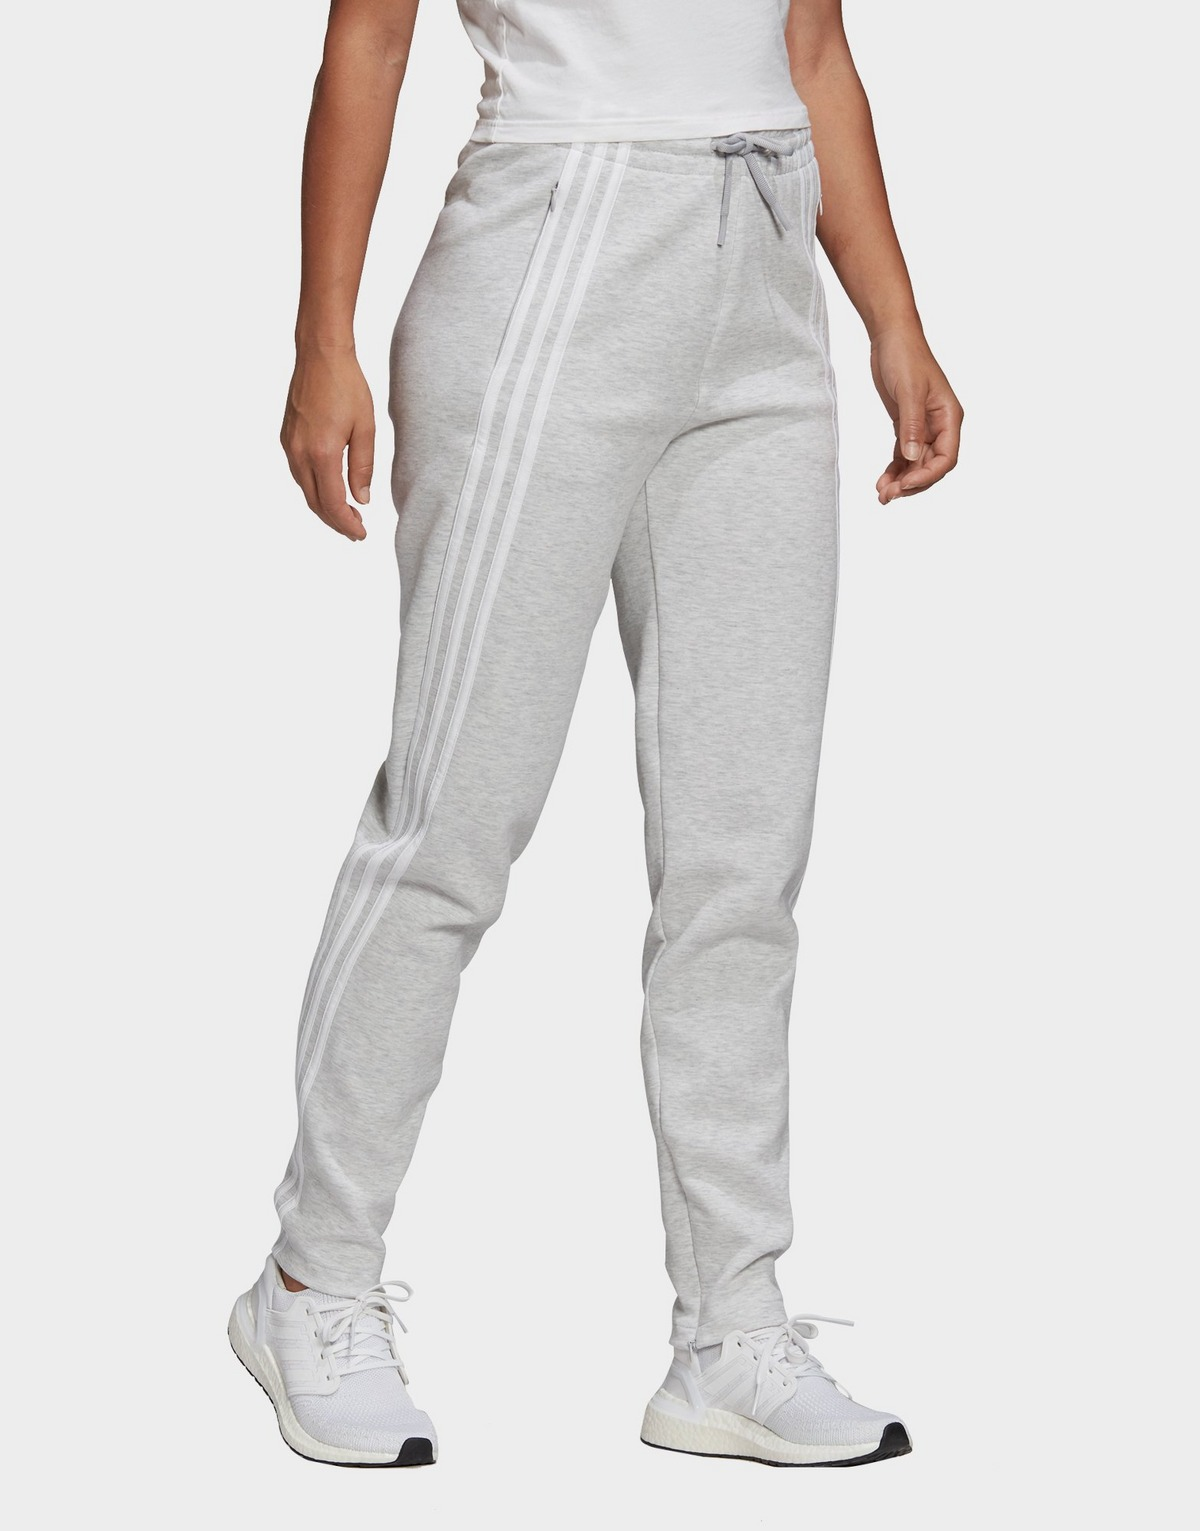 Adidas Performance 3-stripes Doubleknit Zipper Tracksuit Bottoms